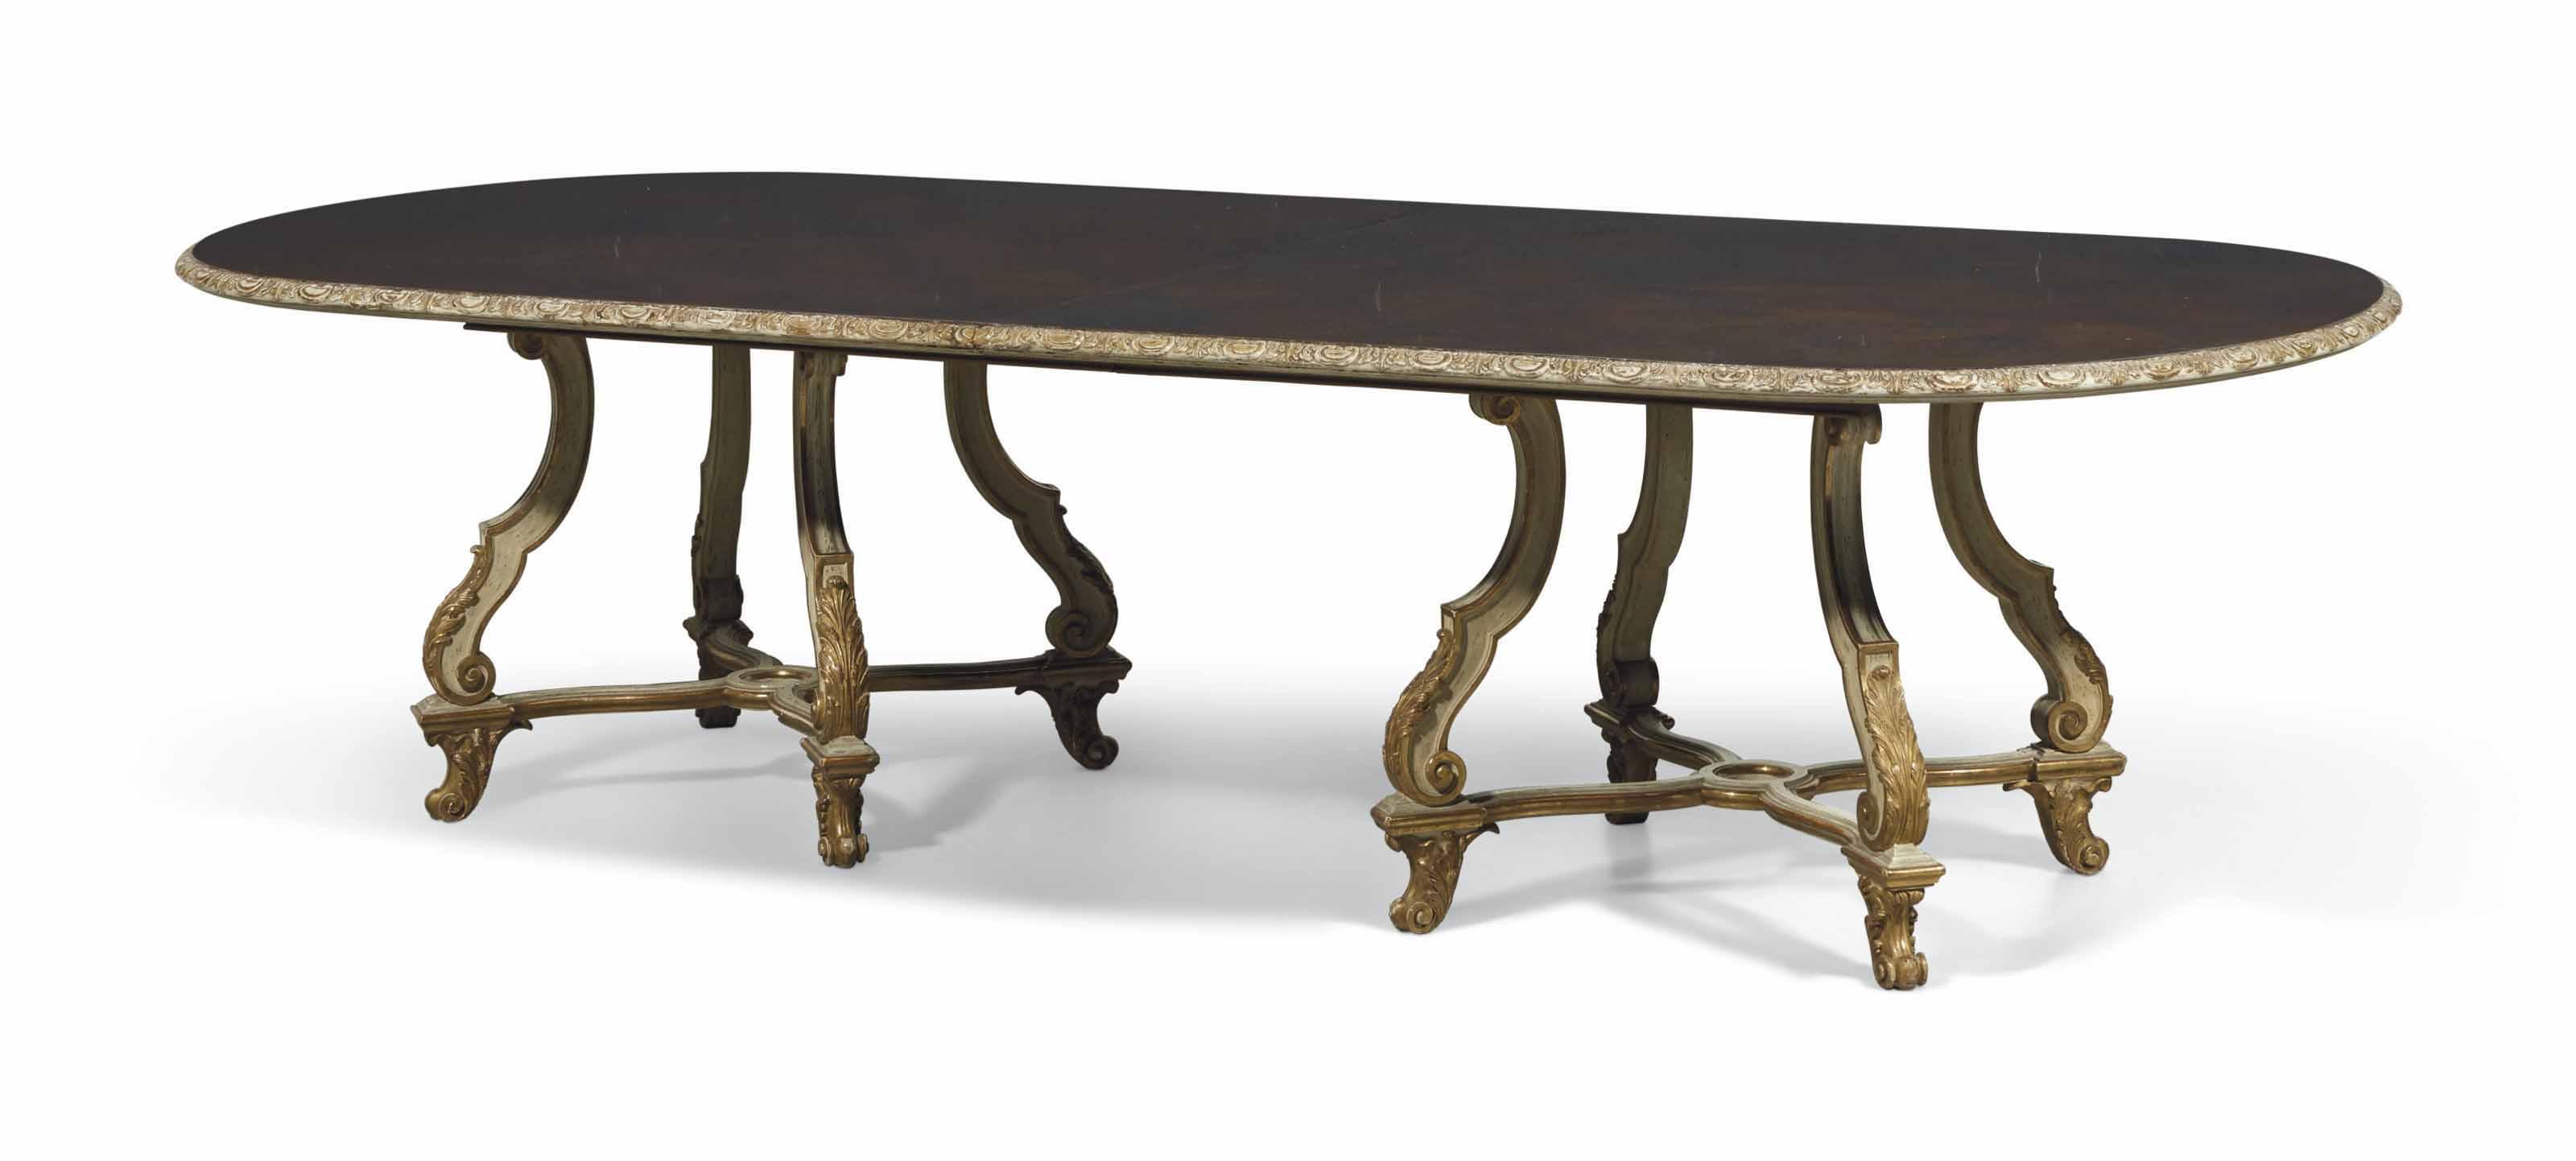 TABLE DE SALLE A MANGER DU XXe SIECLE